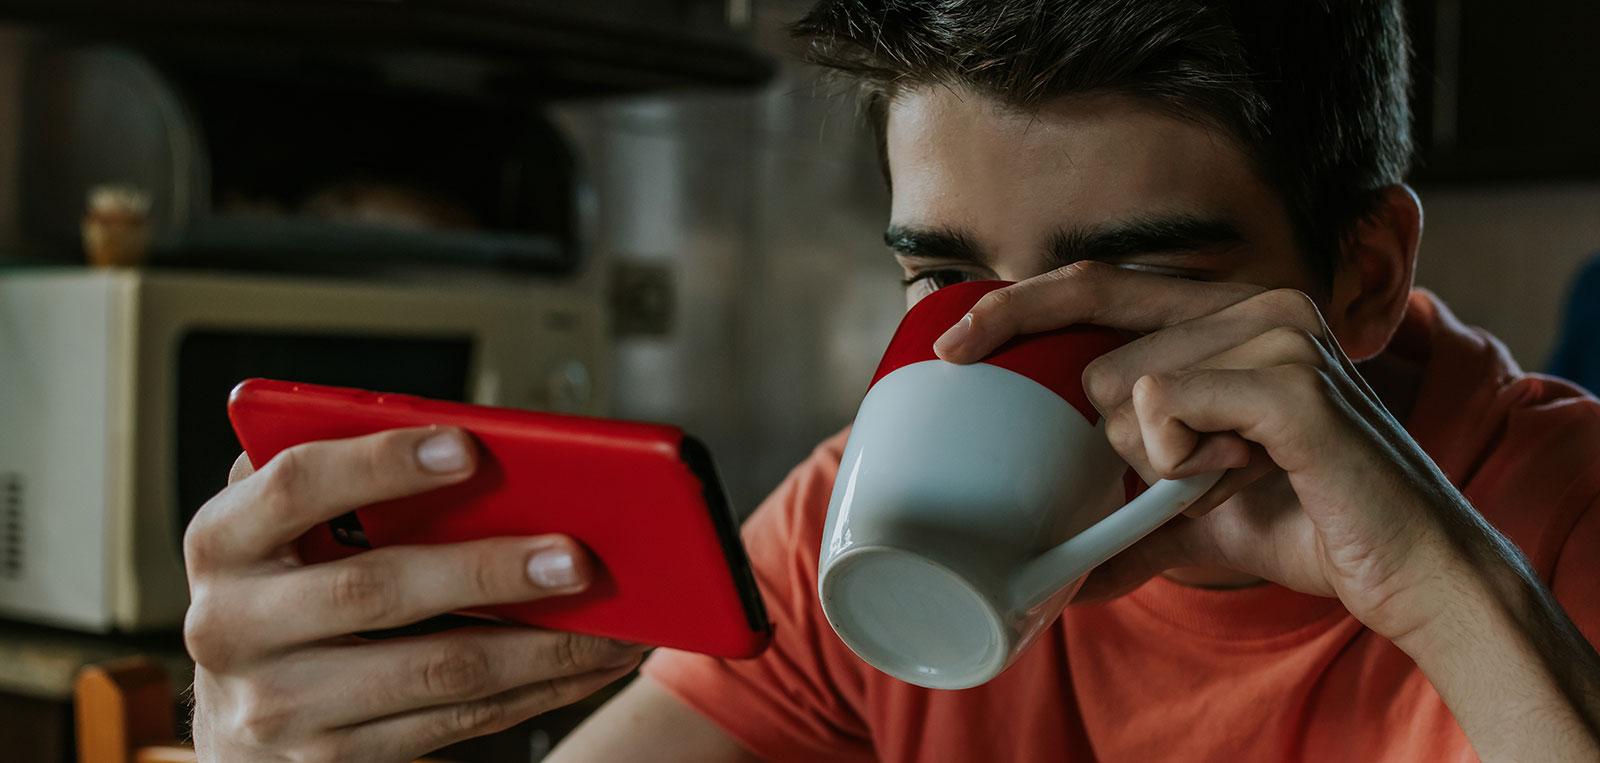 Kaffee lenkt ab